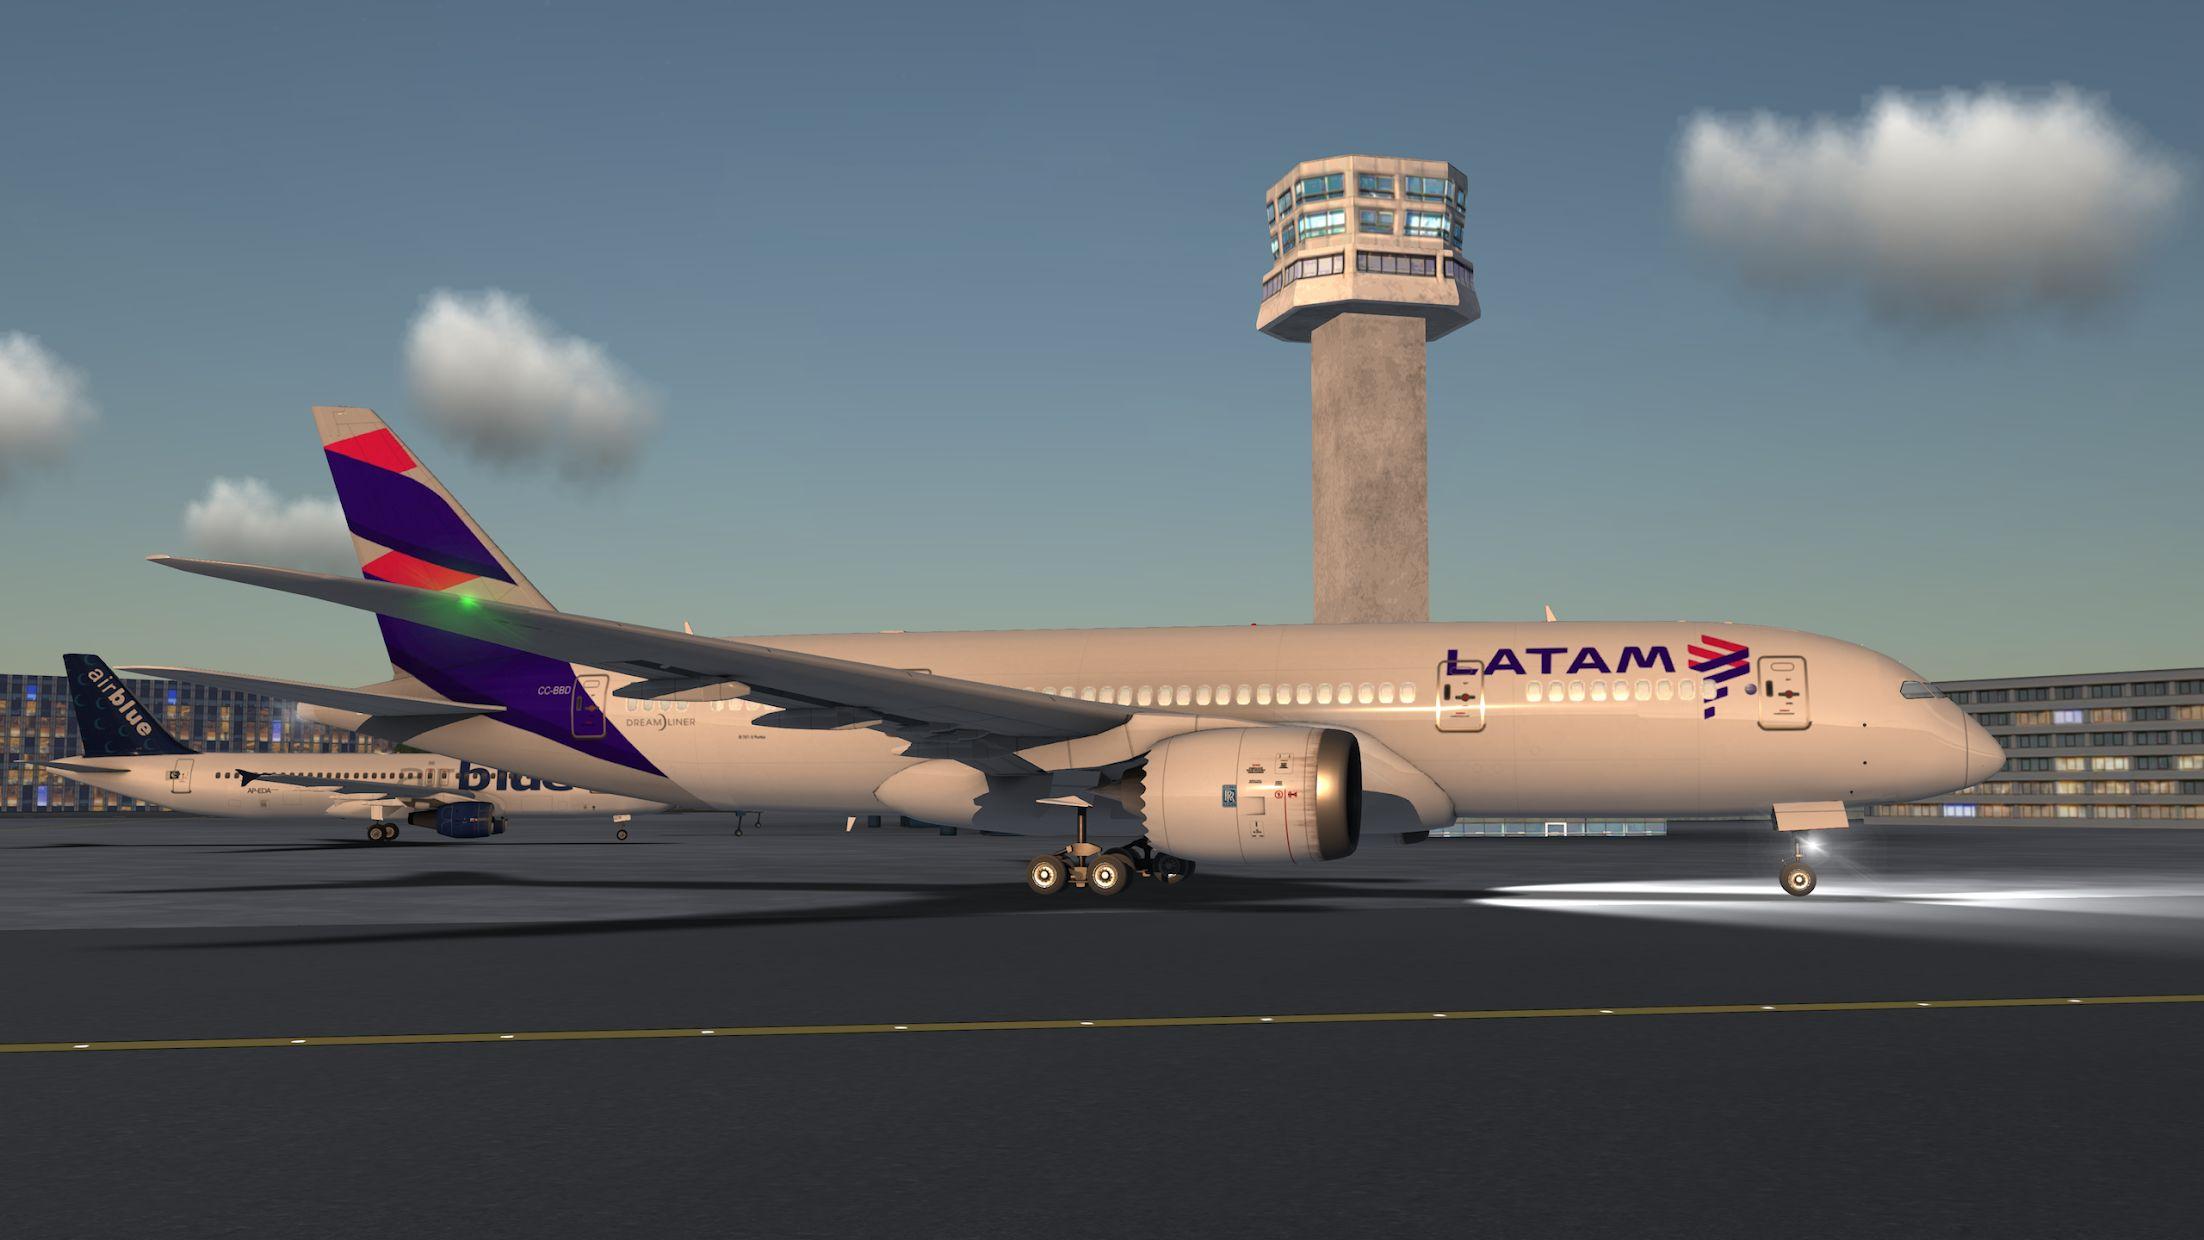 RFS - 真实飞行模拟 游戏截图4